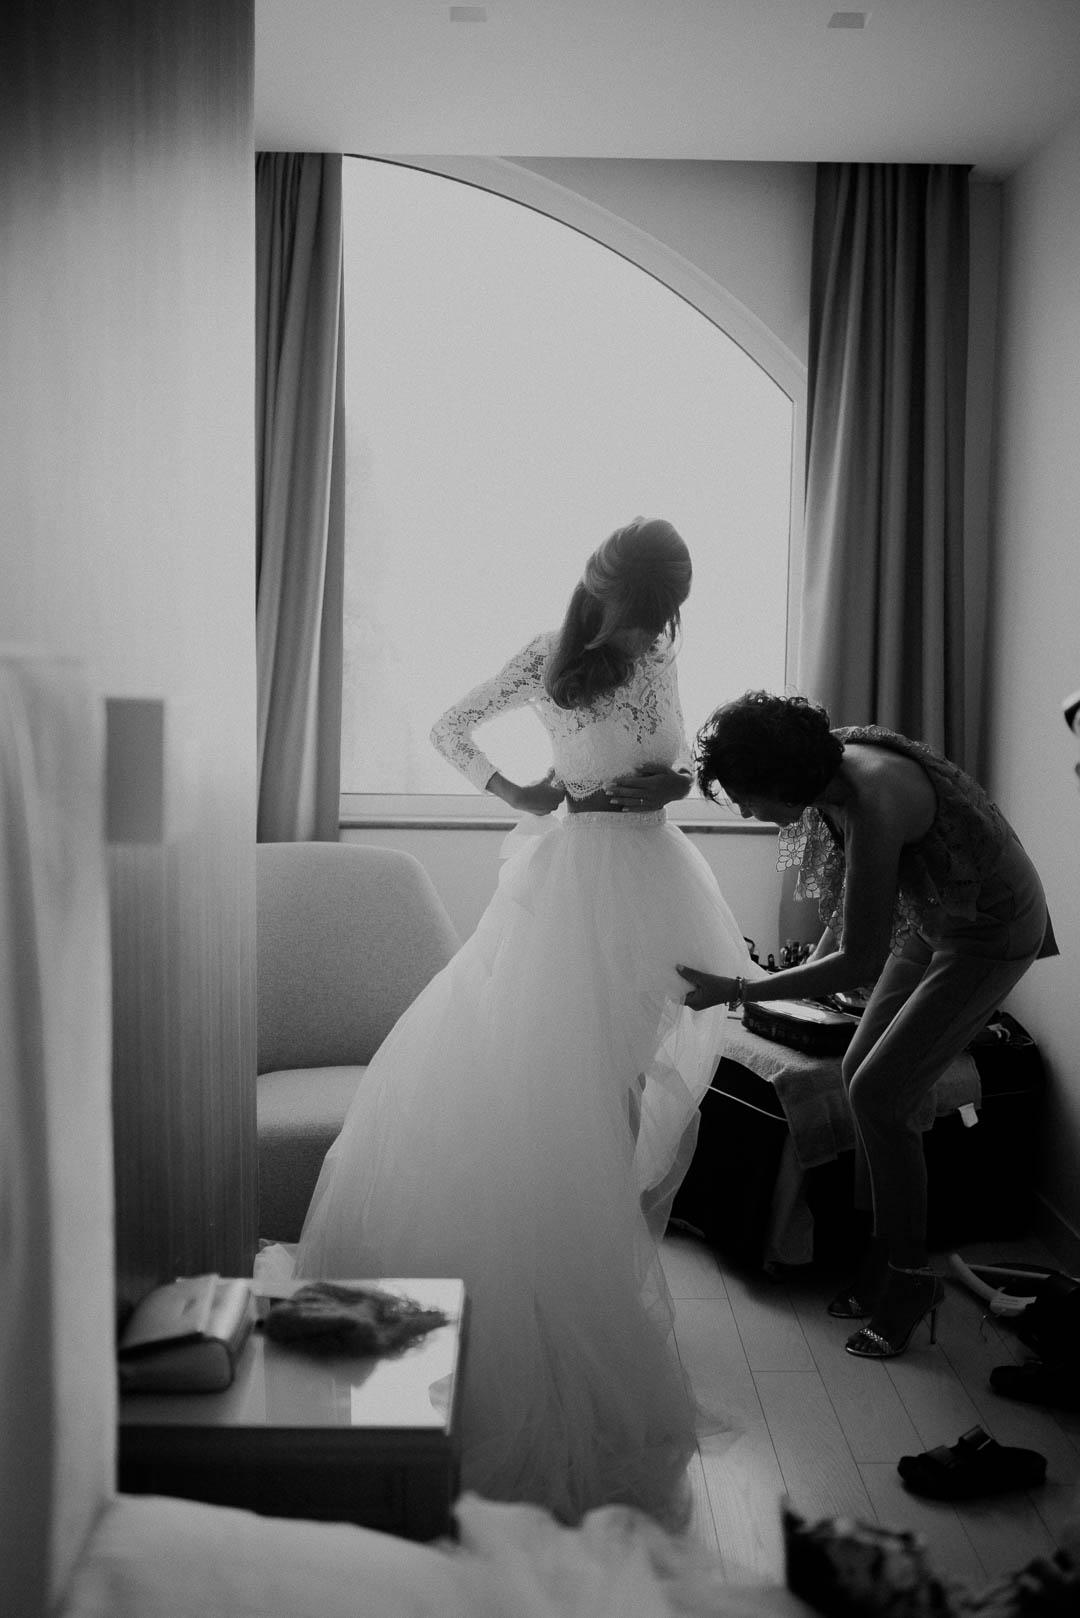 wedding-photographer-destination-fineart-bespoke-reportage-napoli-nabilah-vivianeizzo-spazio46-45